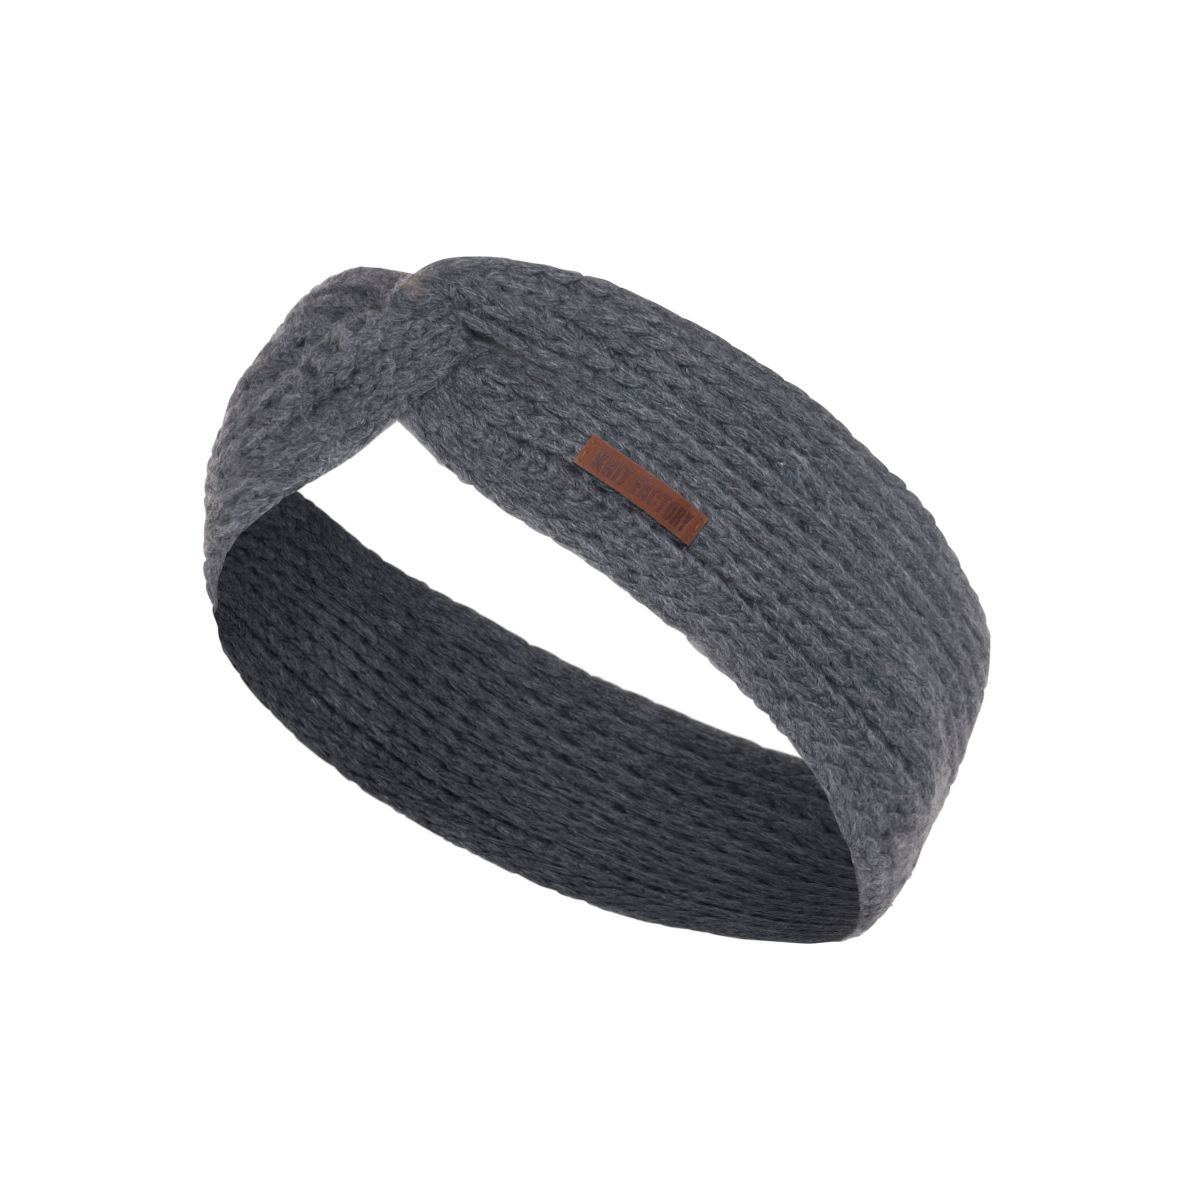 joy headband anthracite